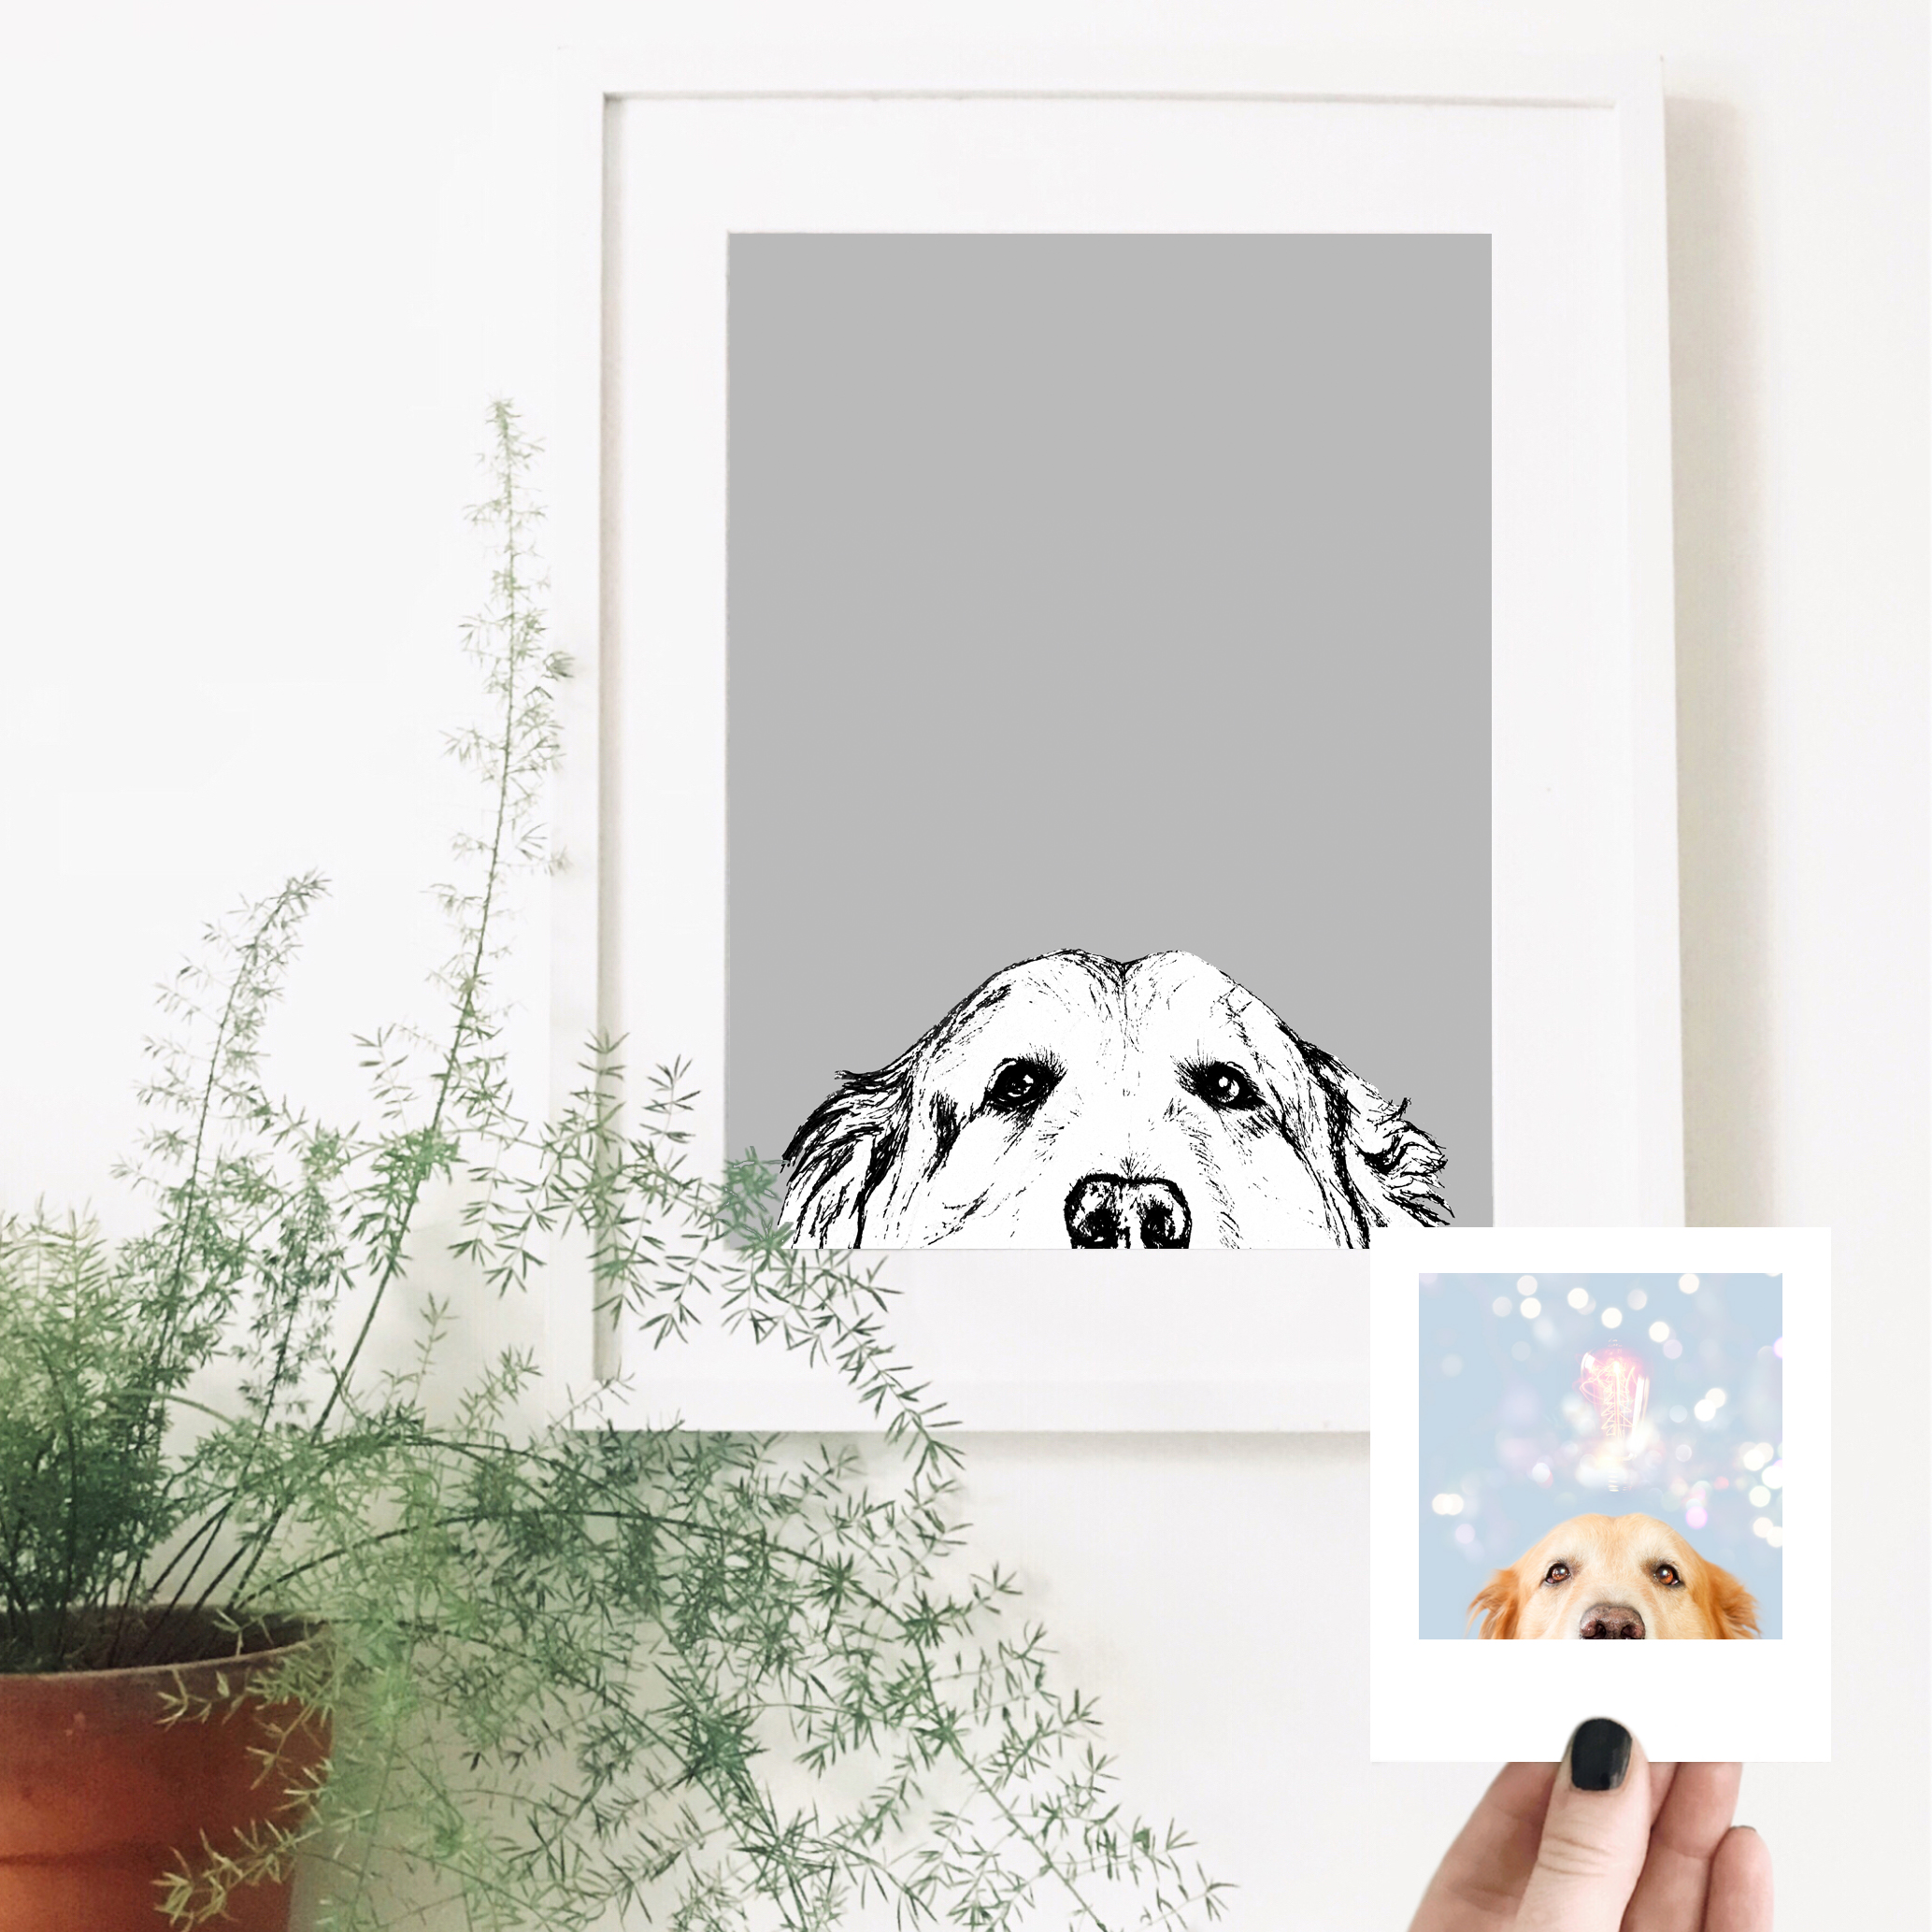 kristina-dog-pet-portrait-drawing.jpg